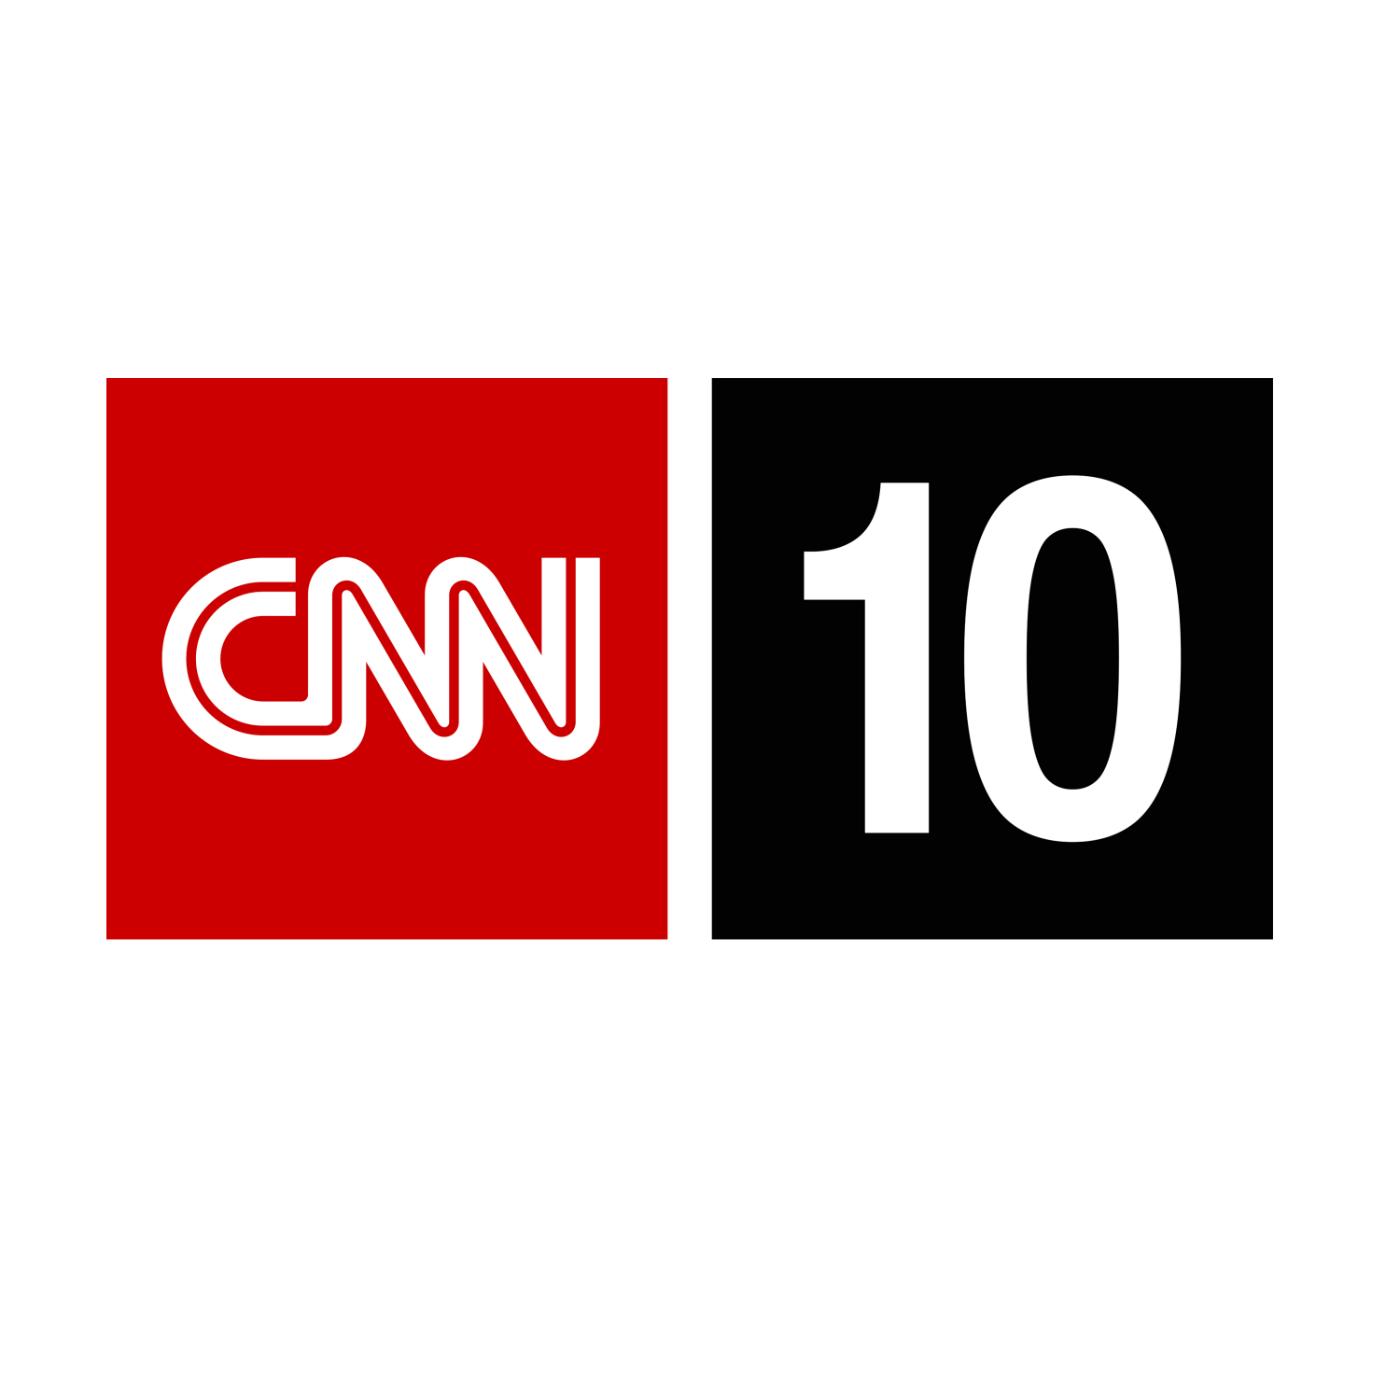 CNN 10 (video) (podcast)